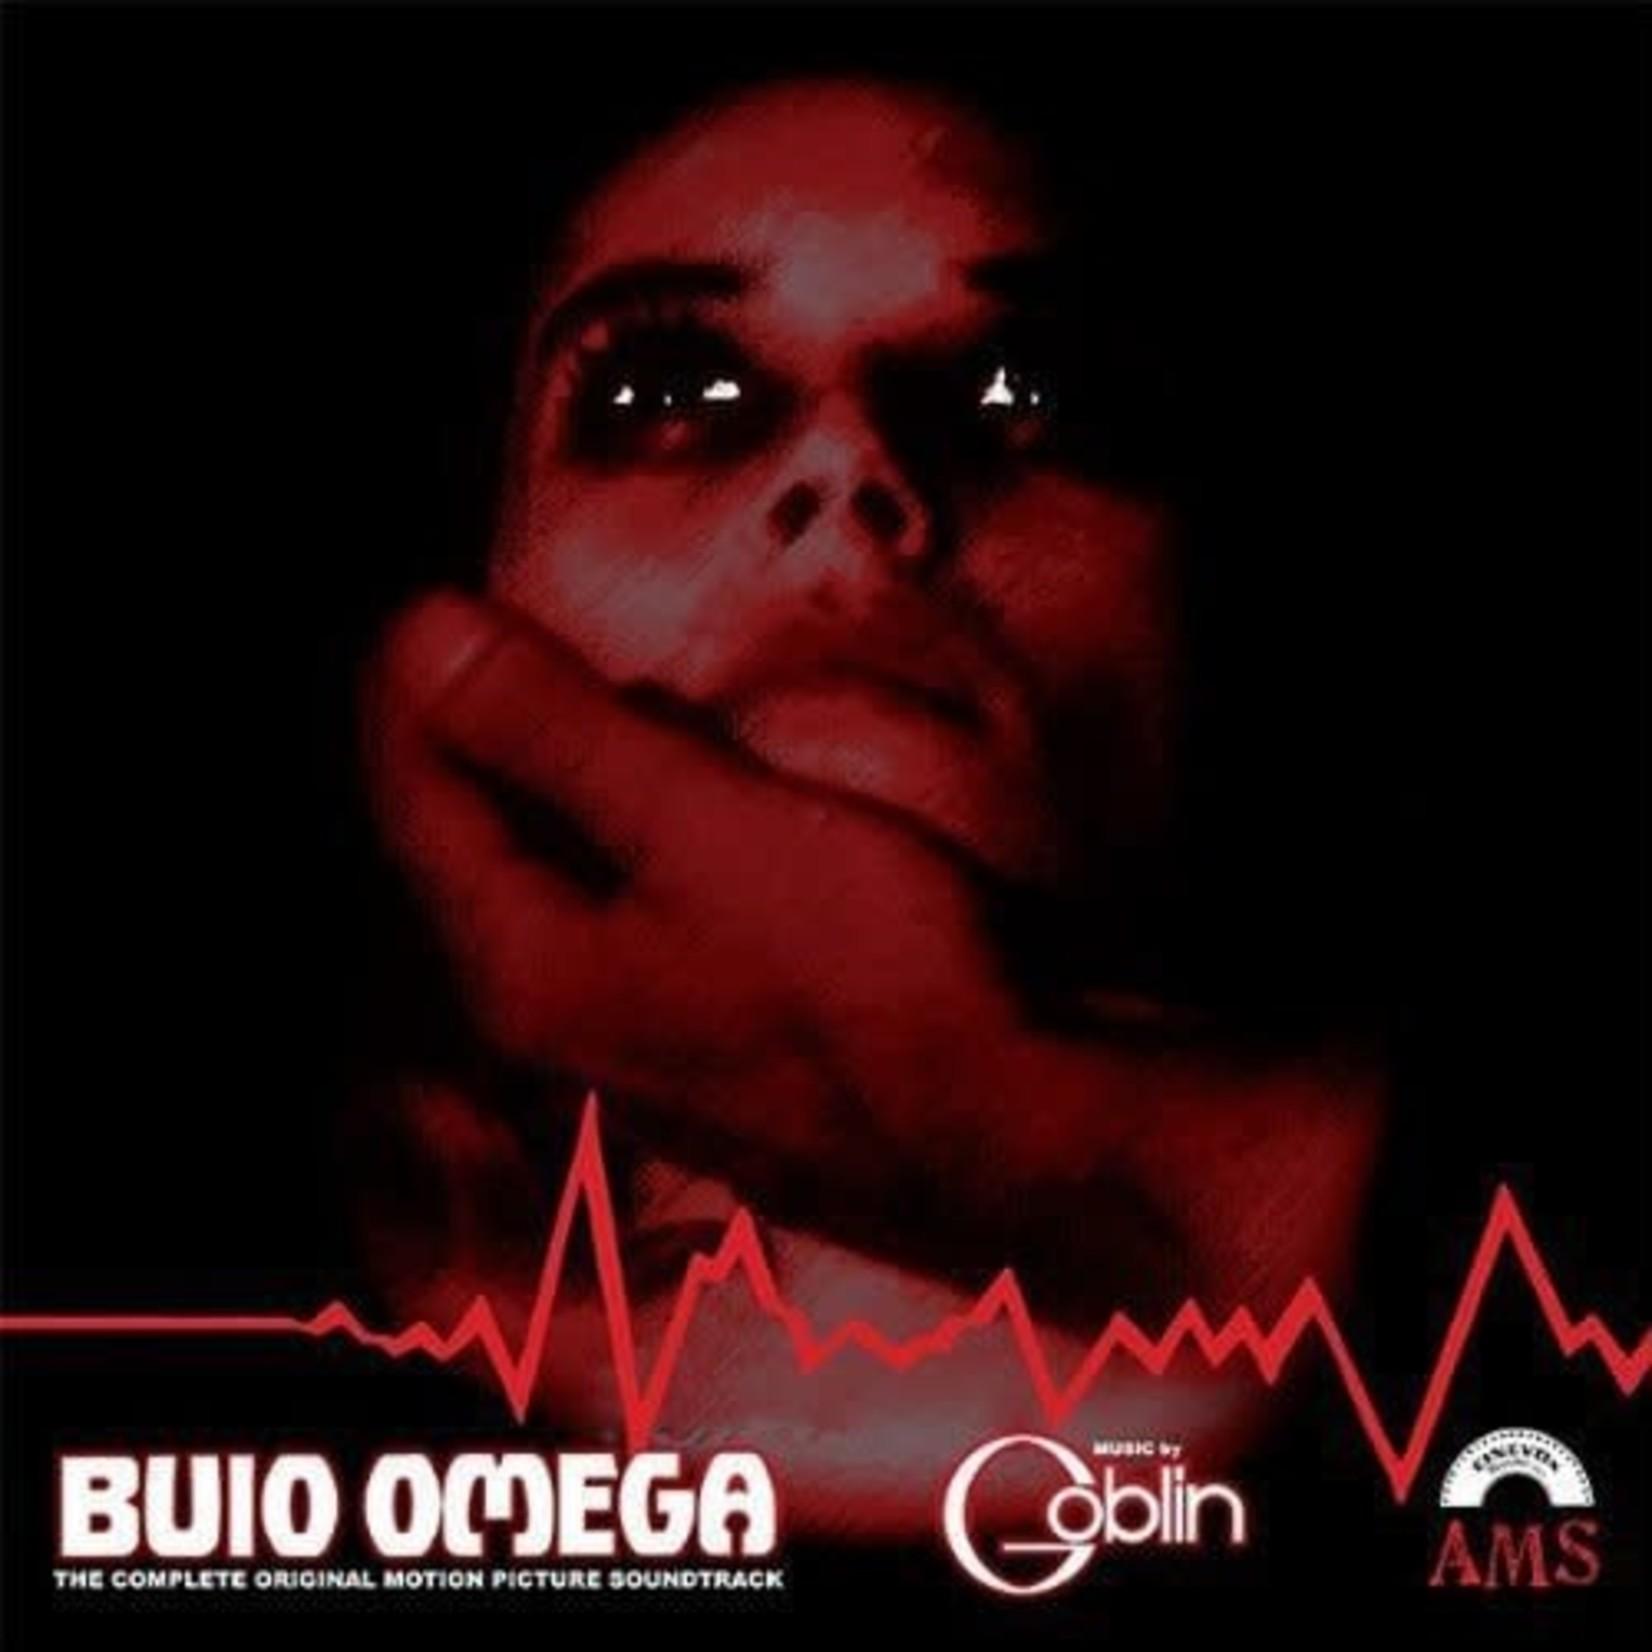 [New] Goblin: Buio Omega (soundtrack)